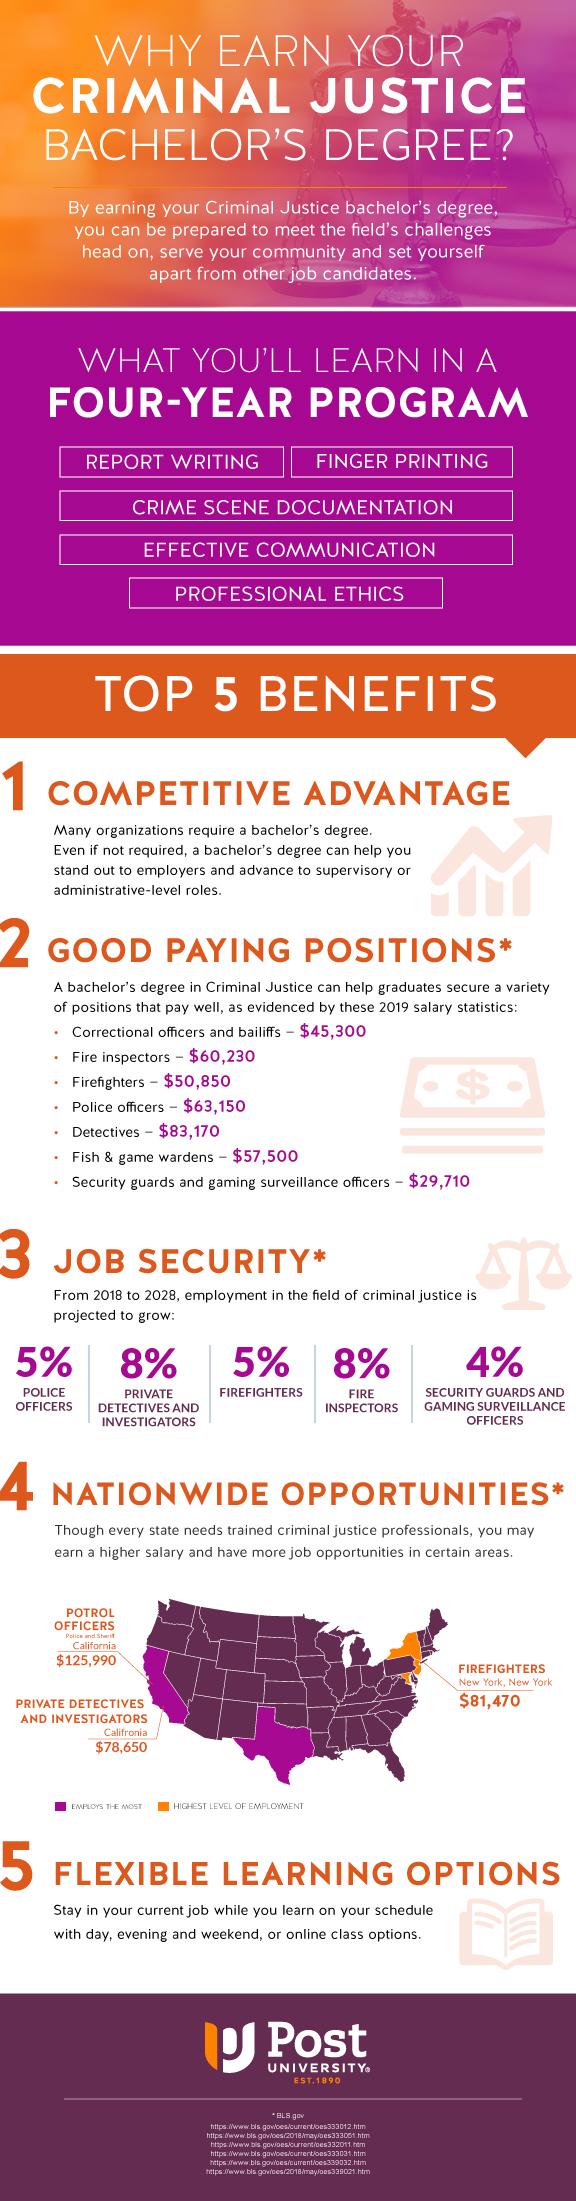 infographic illustrating 5 benefits